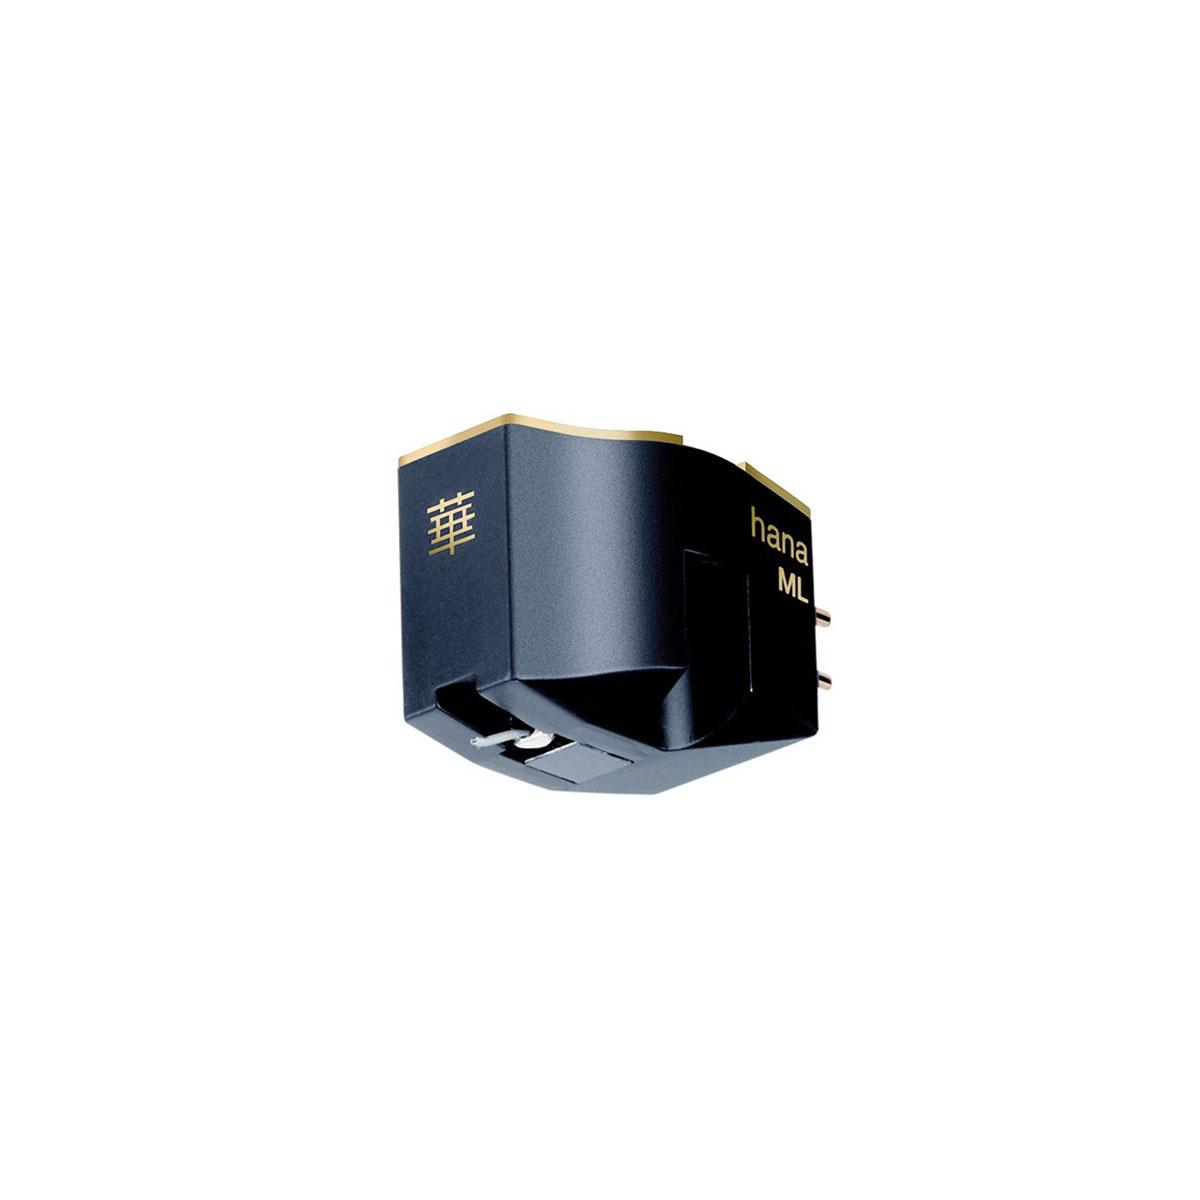 Hana MH & ML cartridges | Audio Venue